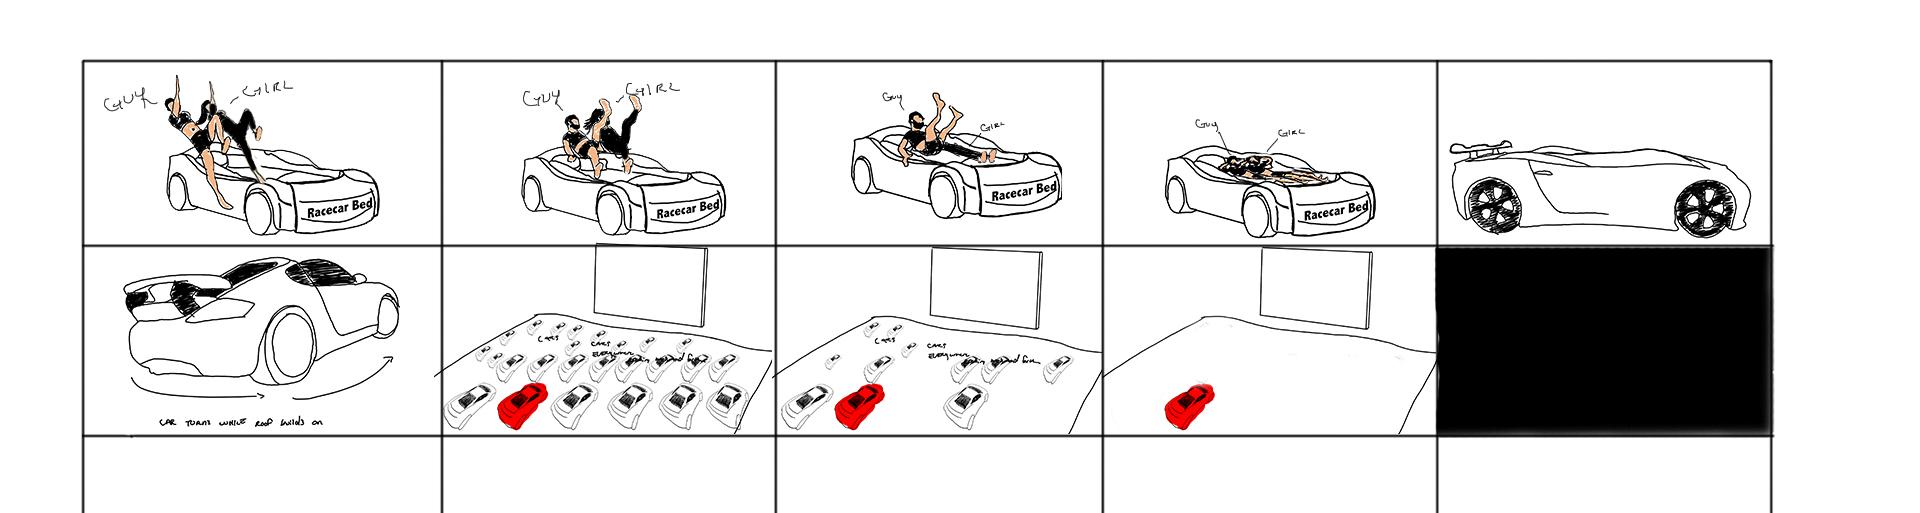 Storyboard_Part 2